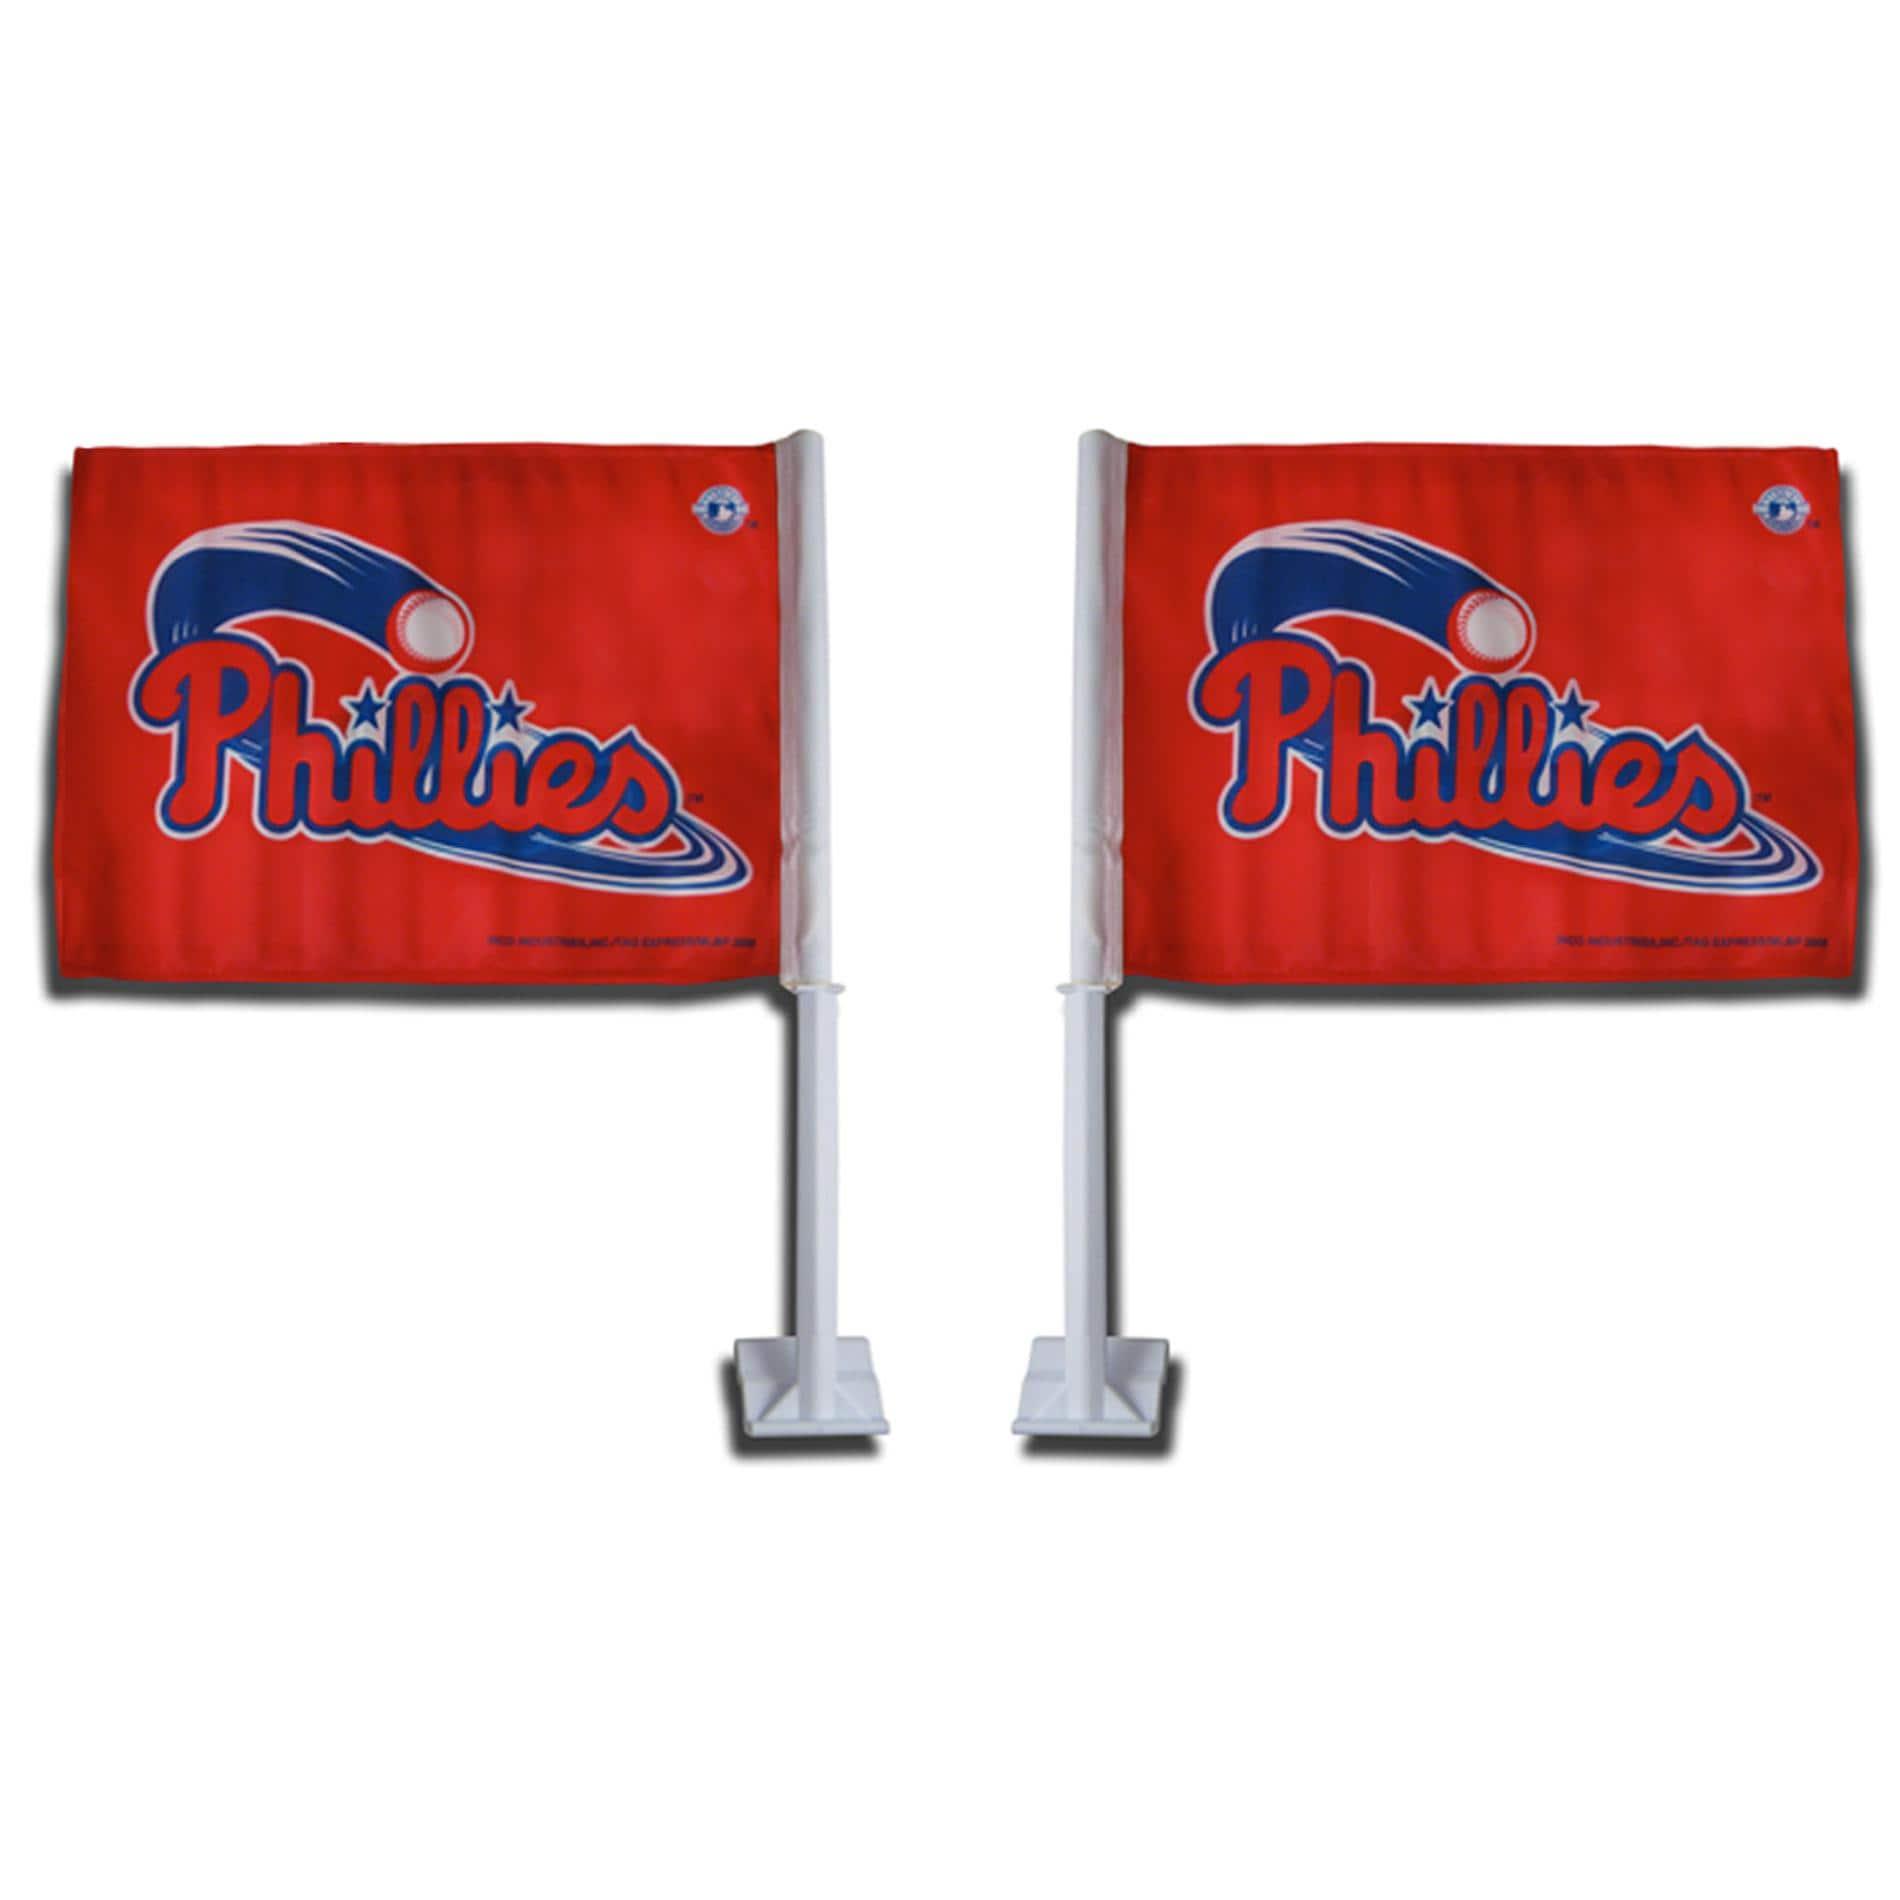 Philadelphia Phillies Car Flags (Set of 2)